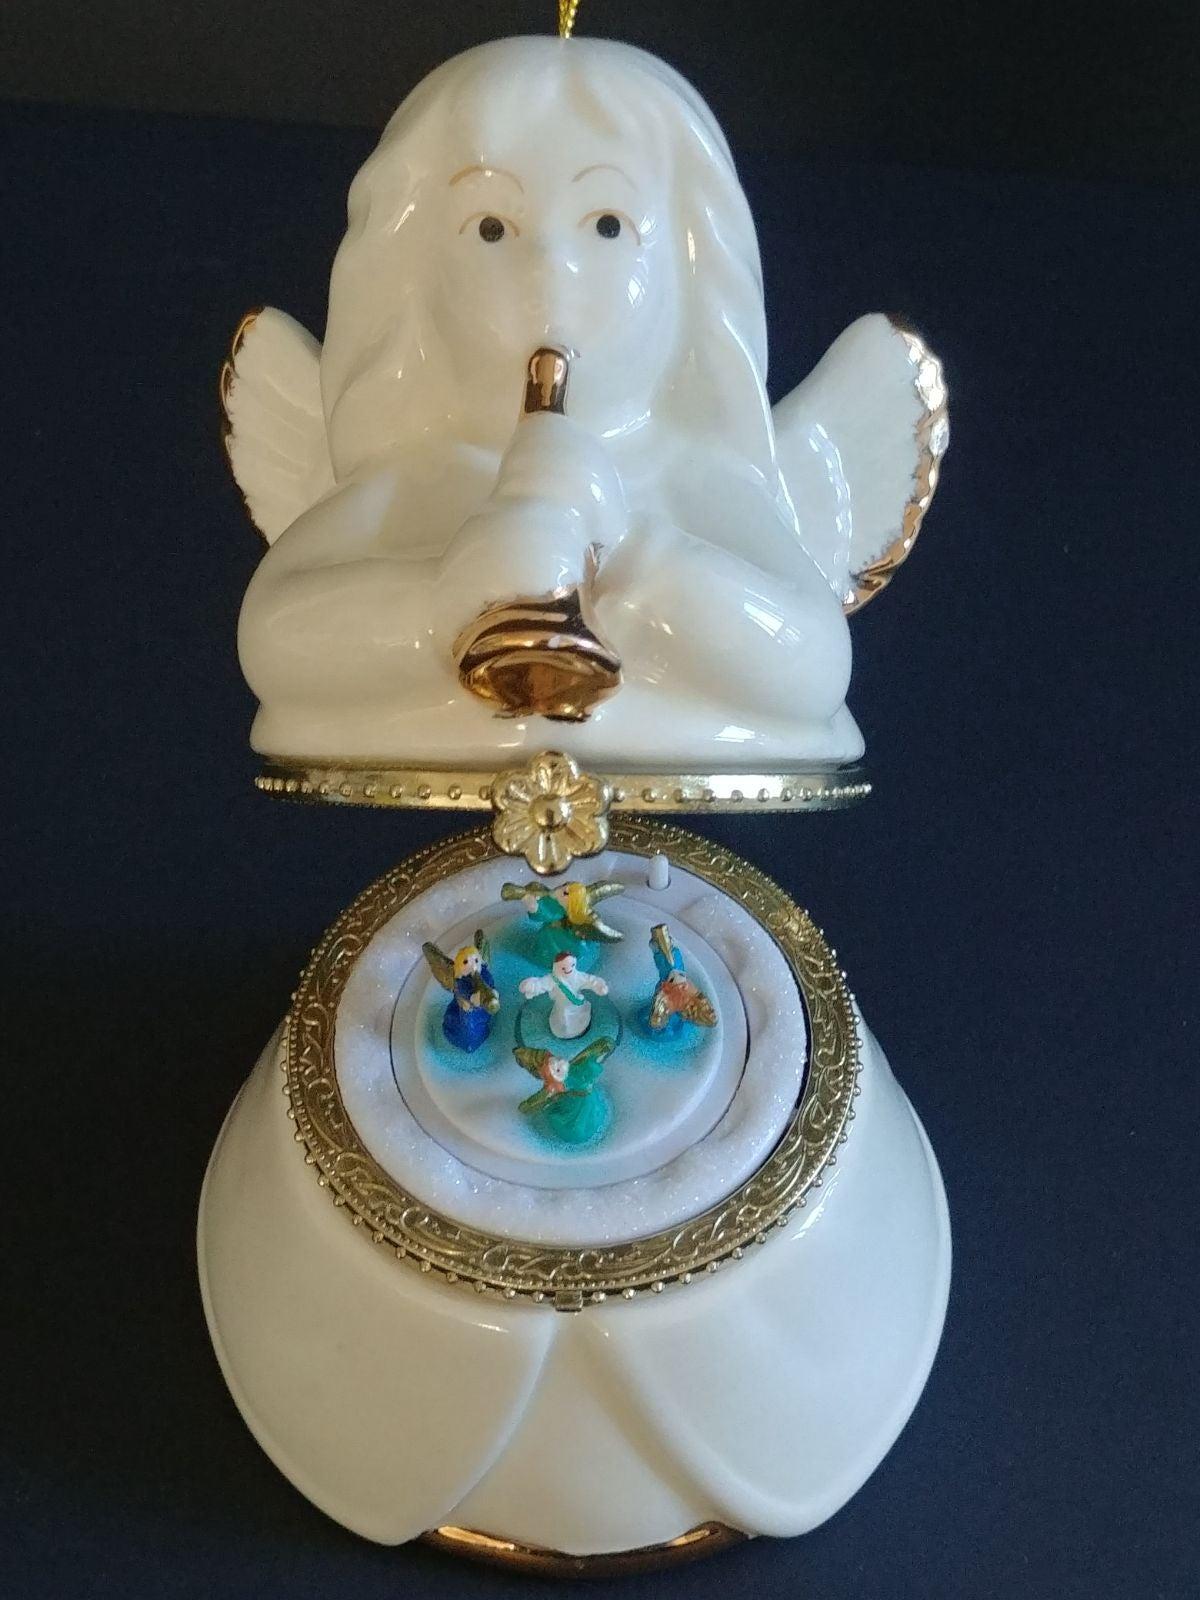 Mr. Christmas Music Angel Ornament